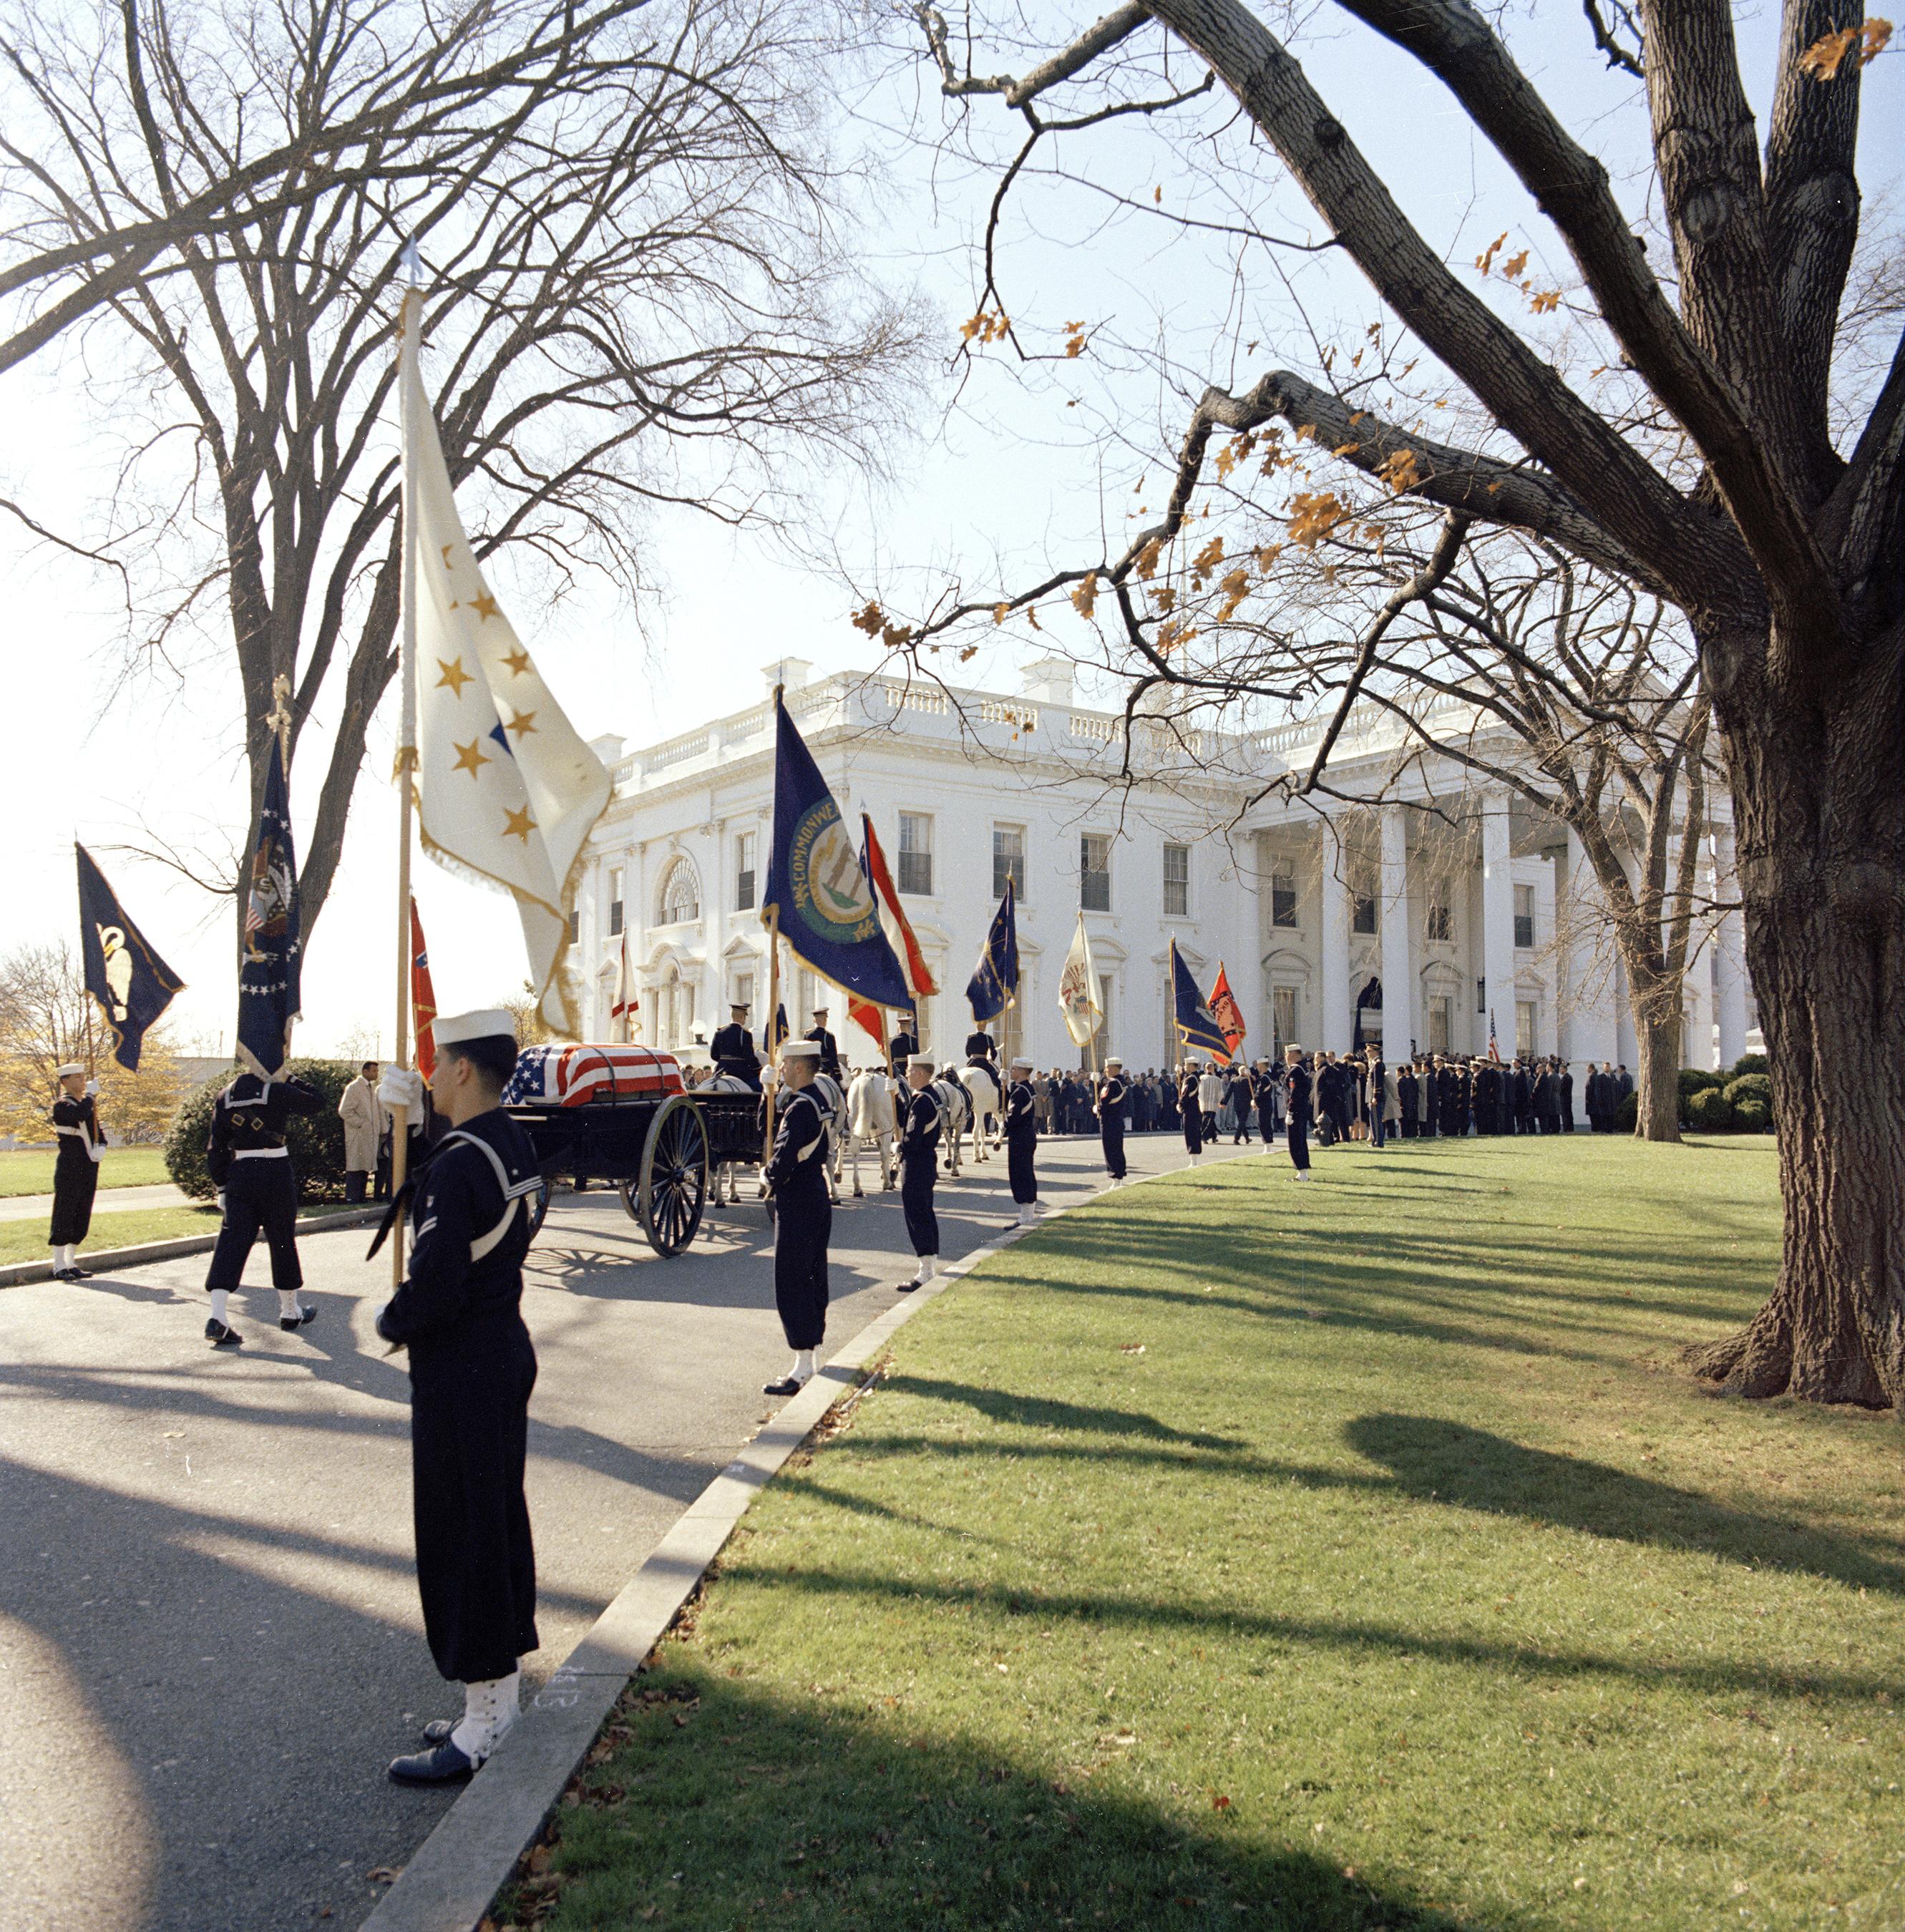 White House November 25, 1963